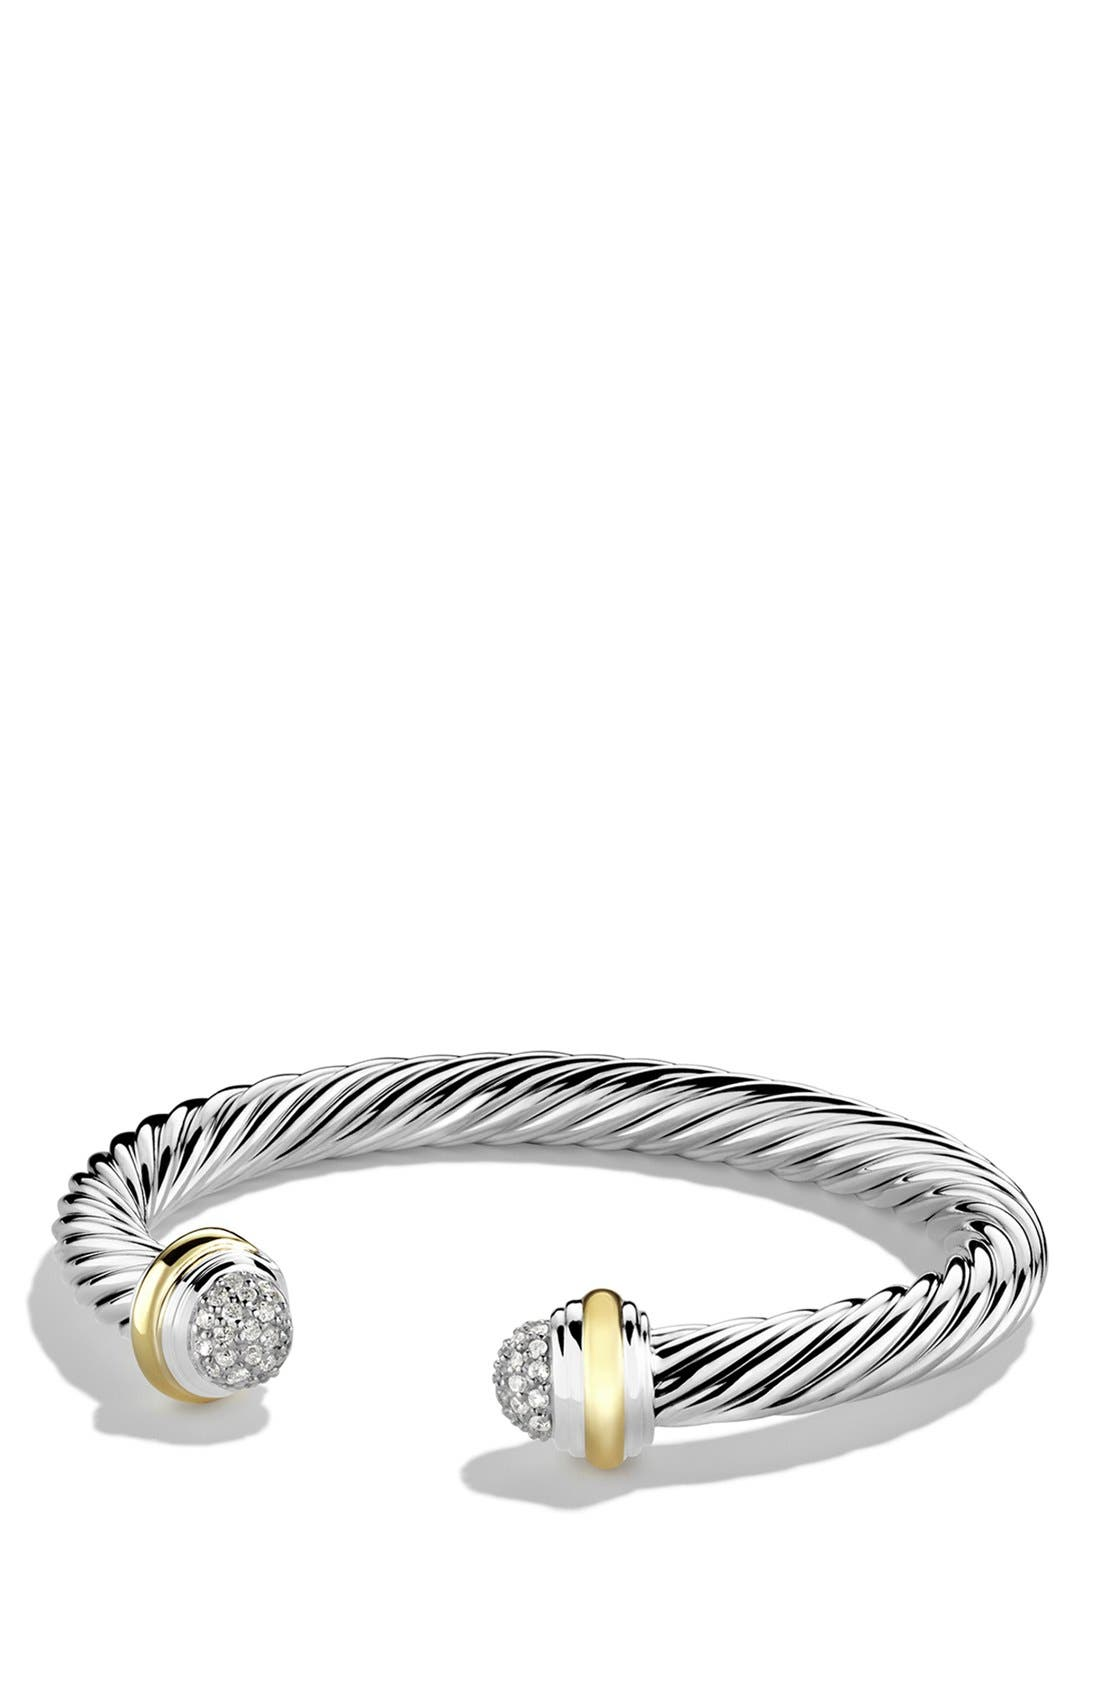 David Yurman Bracelets & Bangles for Women